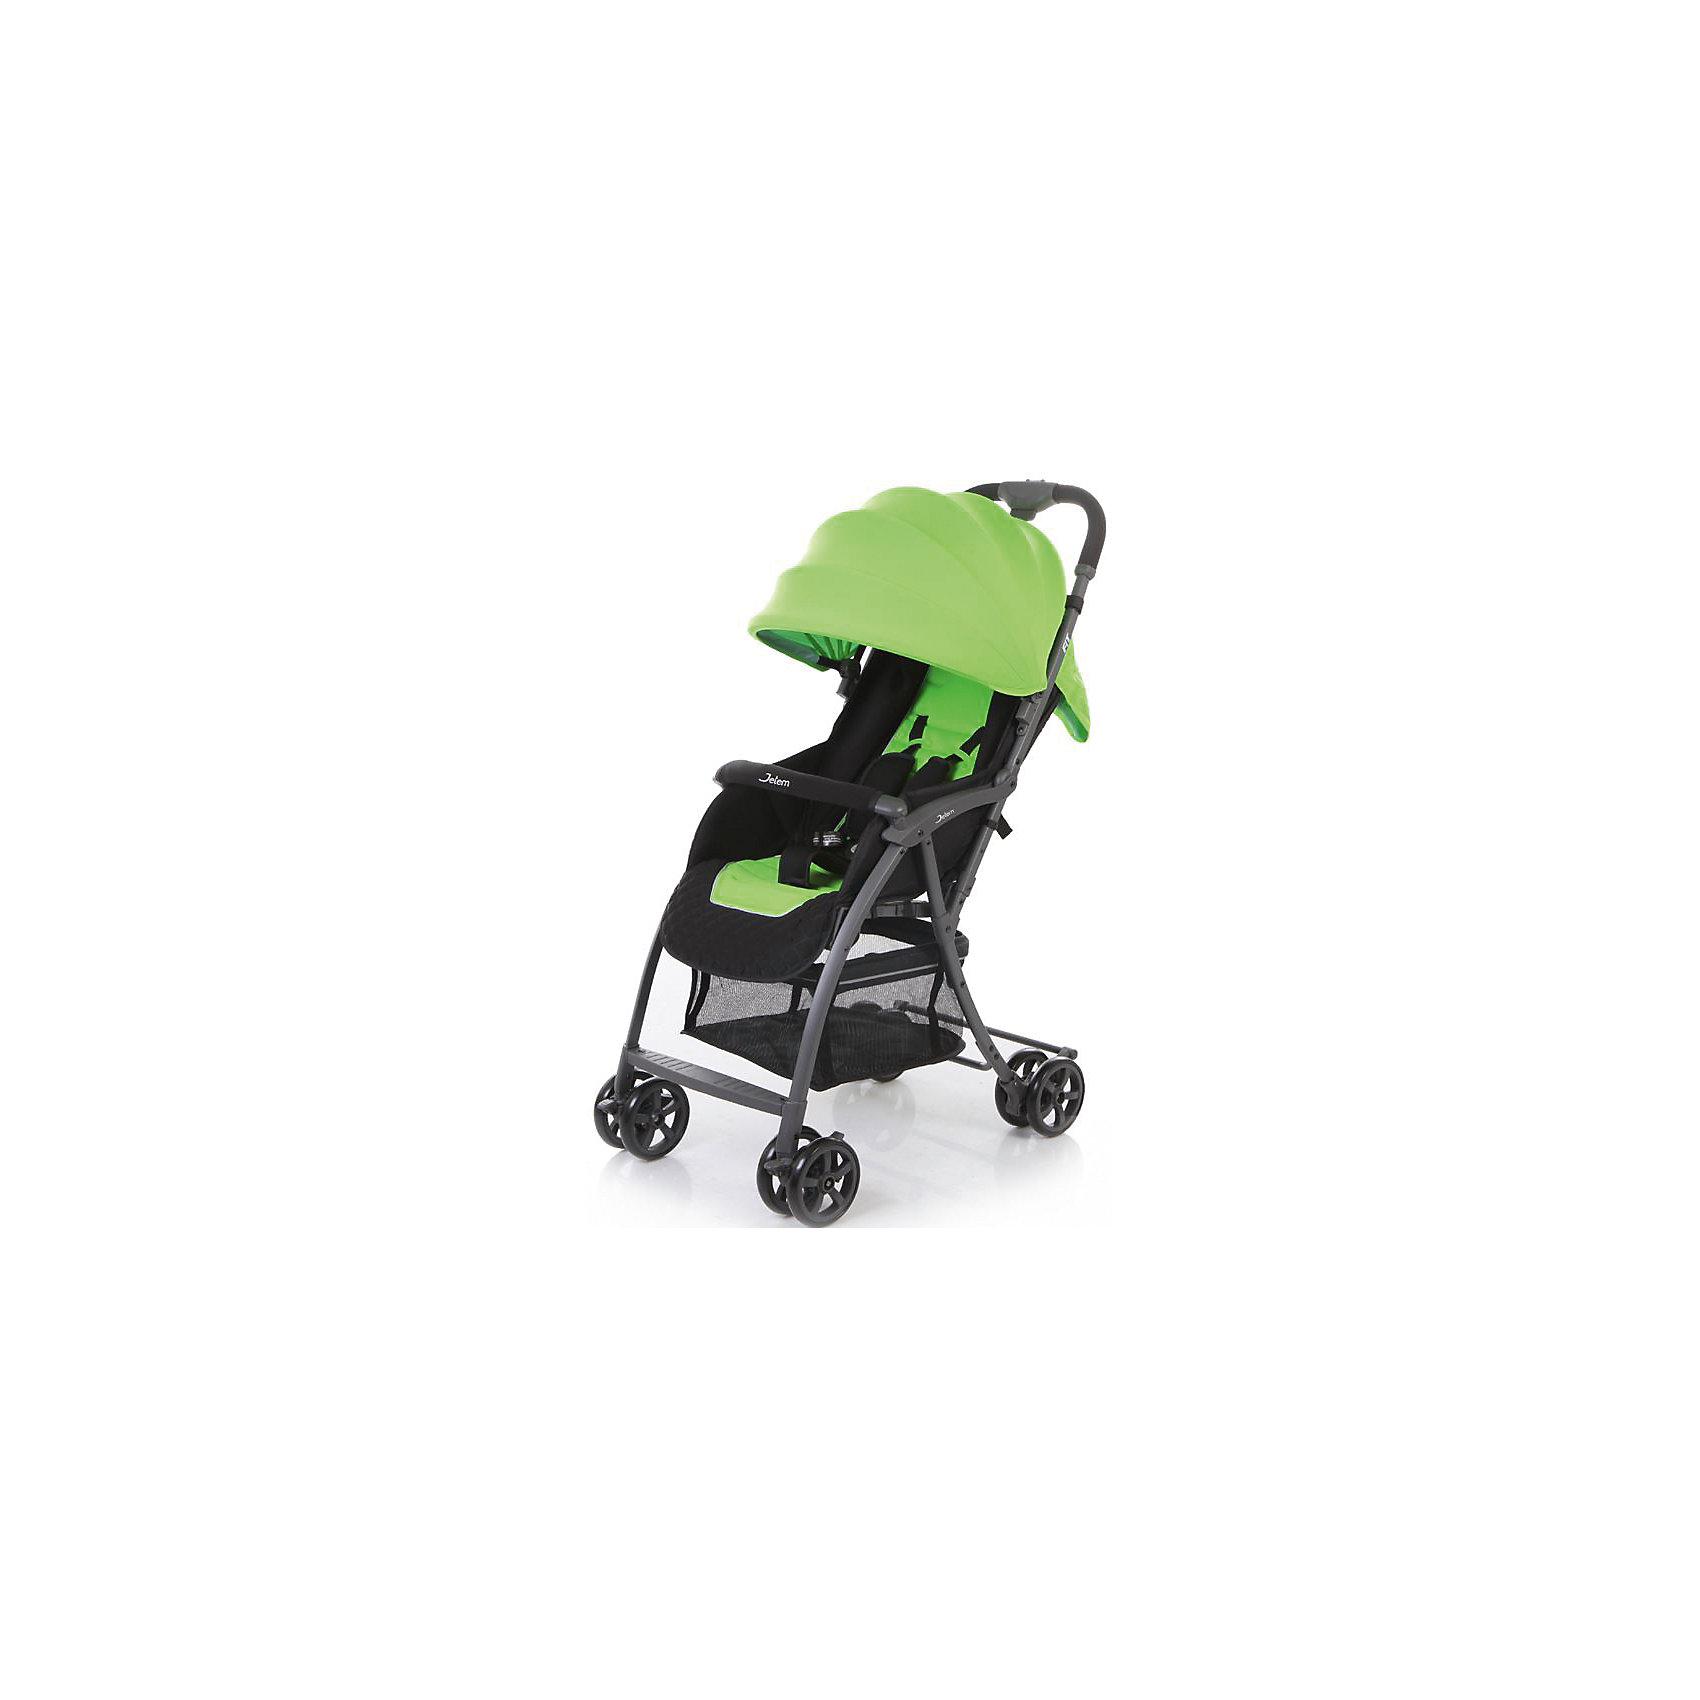 Прогулочная коляска  Fit, Jetem, зеленый